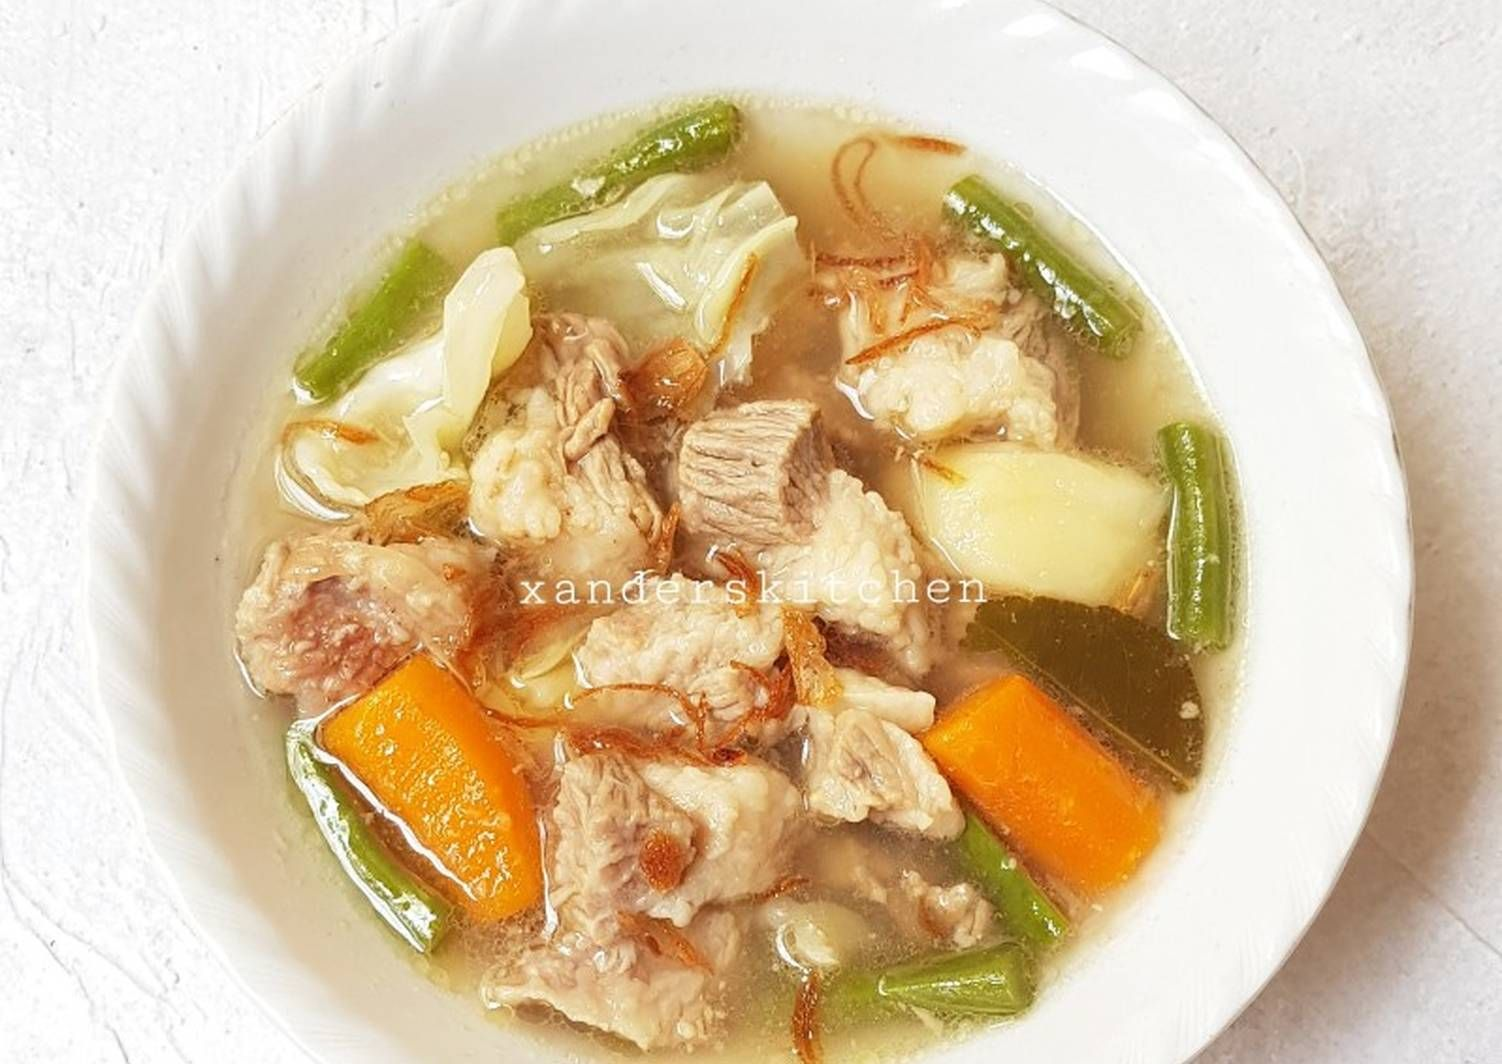 Resep Sop Tetelan Sedap Bangettt Oleh Xander S Kitchen Resep Resep Resep Masakan Masakan Indonesia